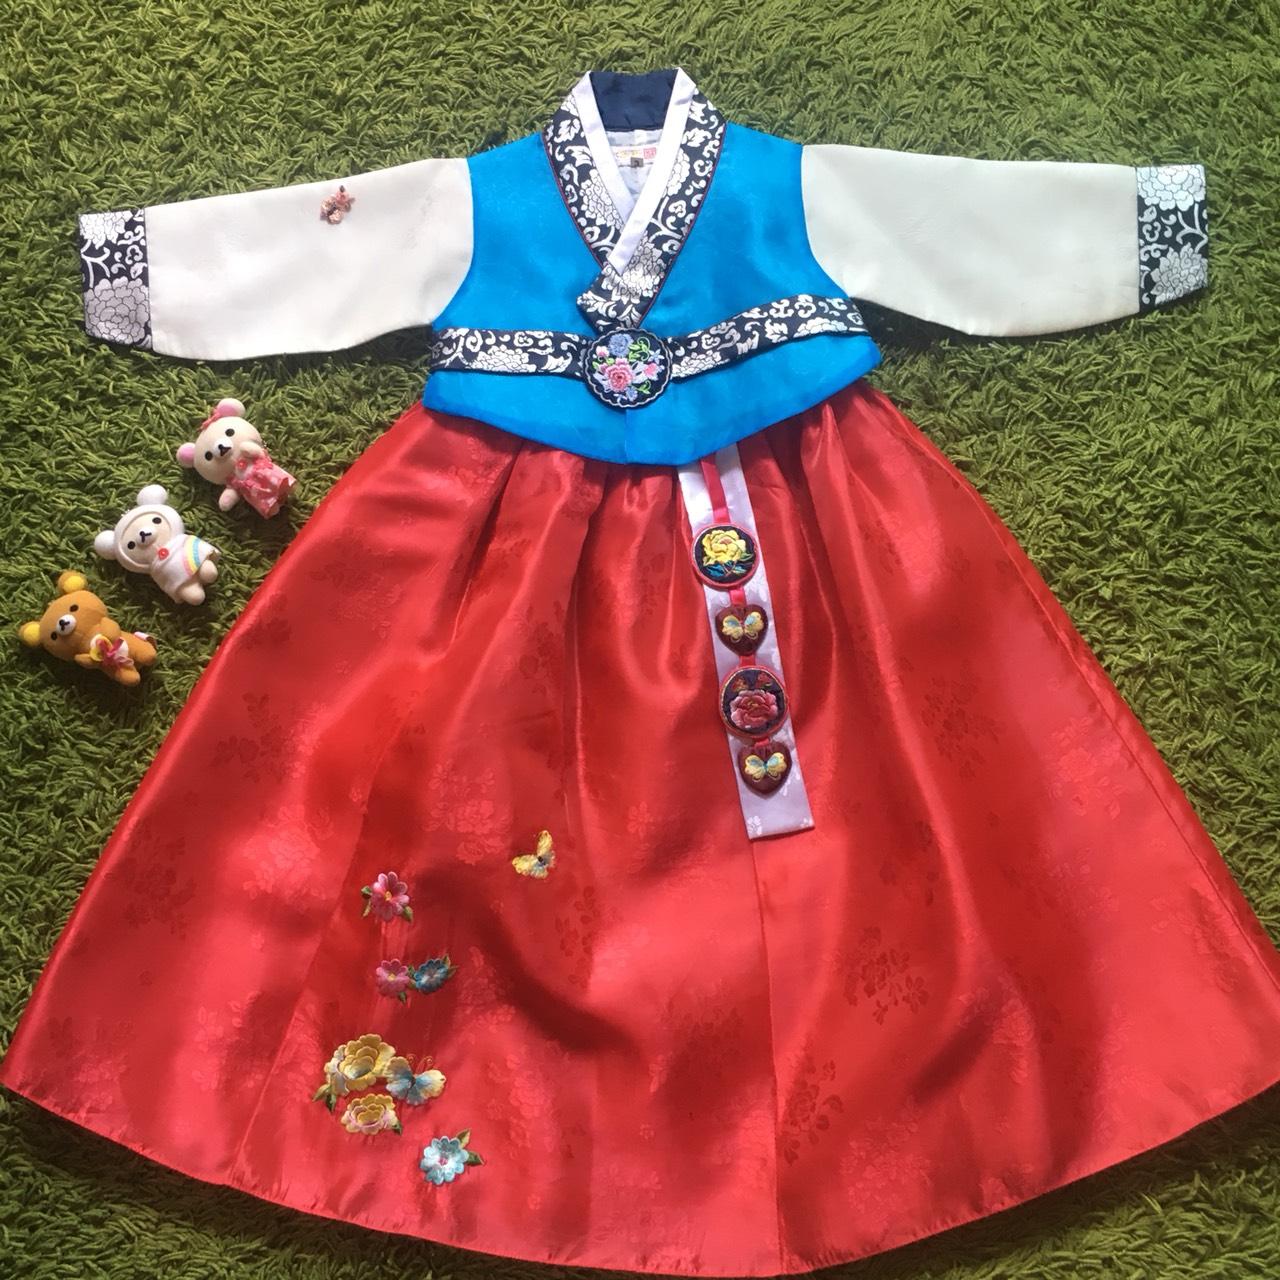 Hanbok Girl ฮันบกผ้าไหมอย่างดีสีฟ้าสดใส สำหรับเด็ก 3 ขวบ